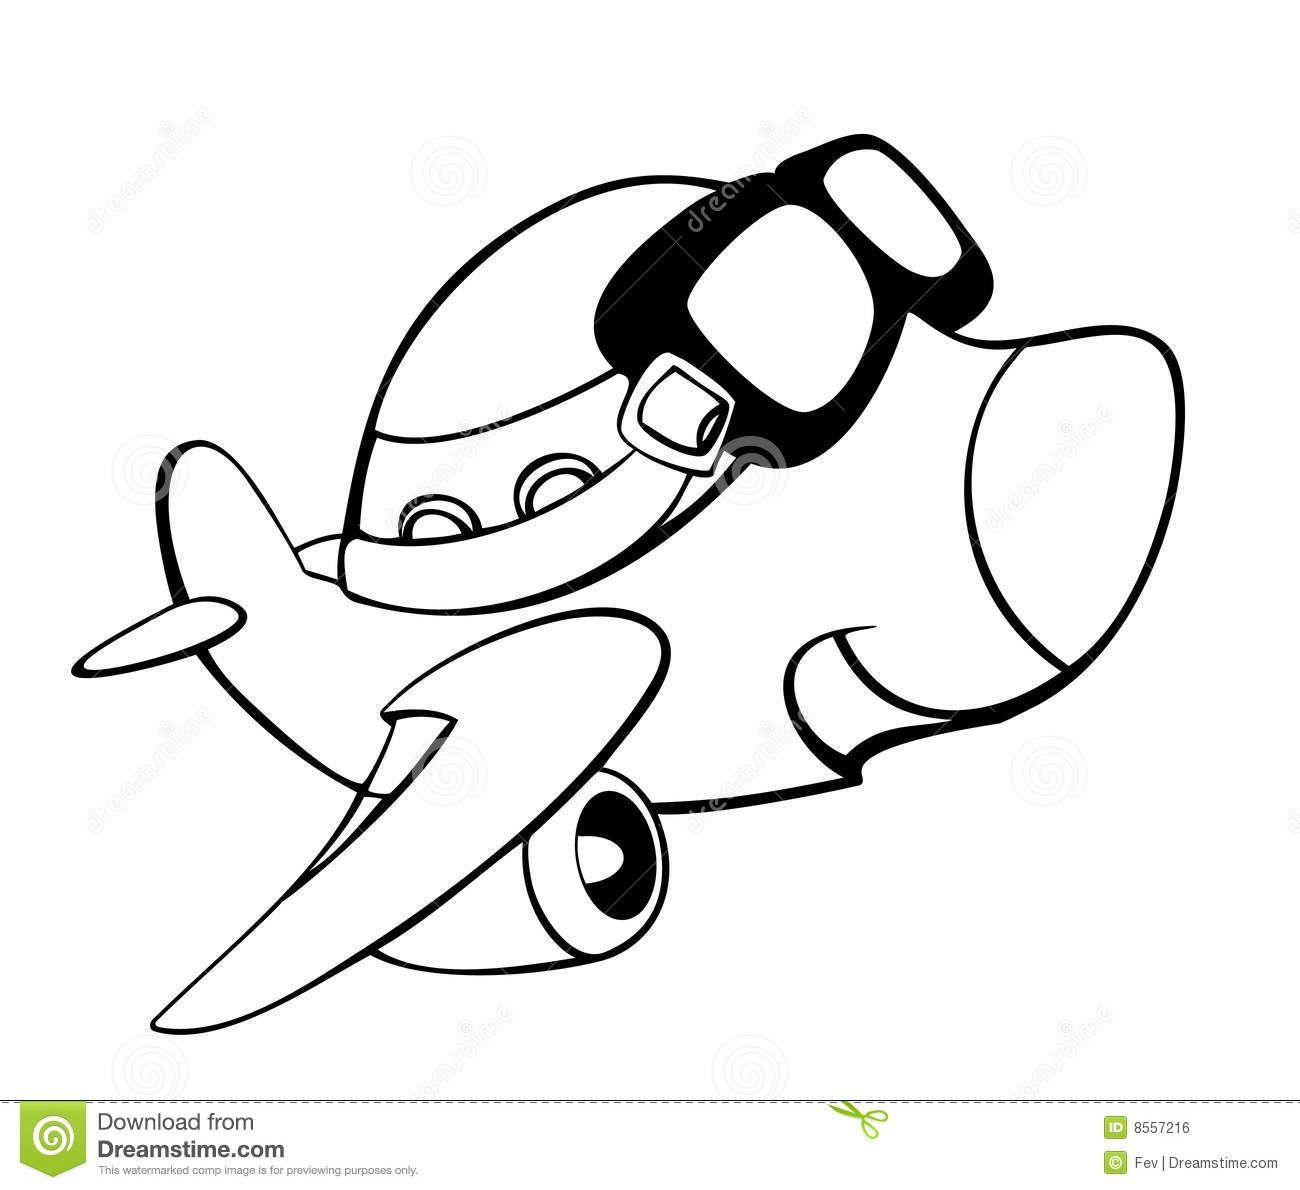 Avion dessin recherche google dessin dessin contour - Avion en dessin ...